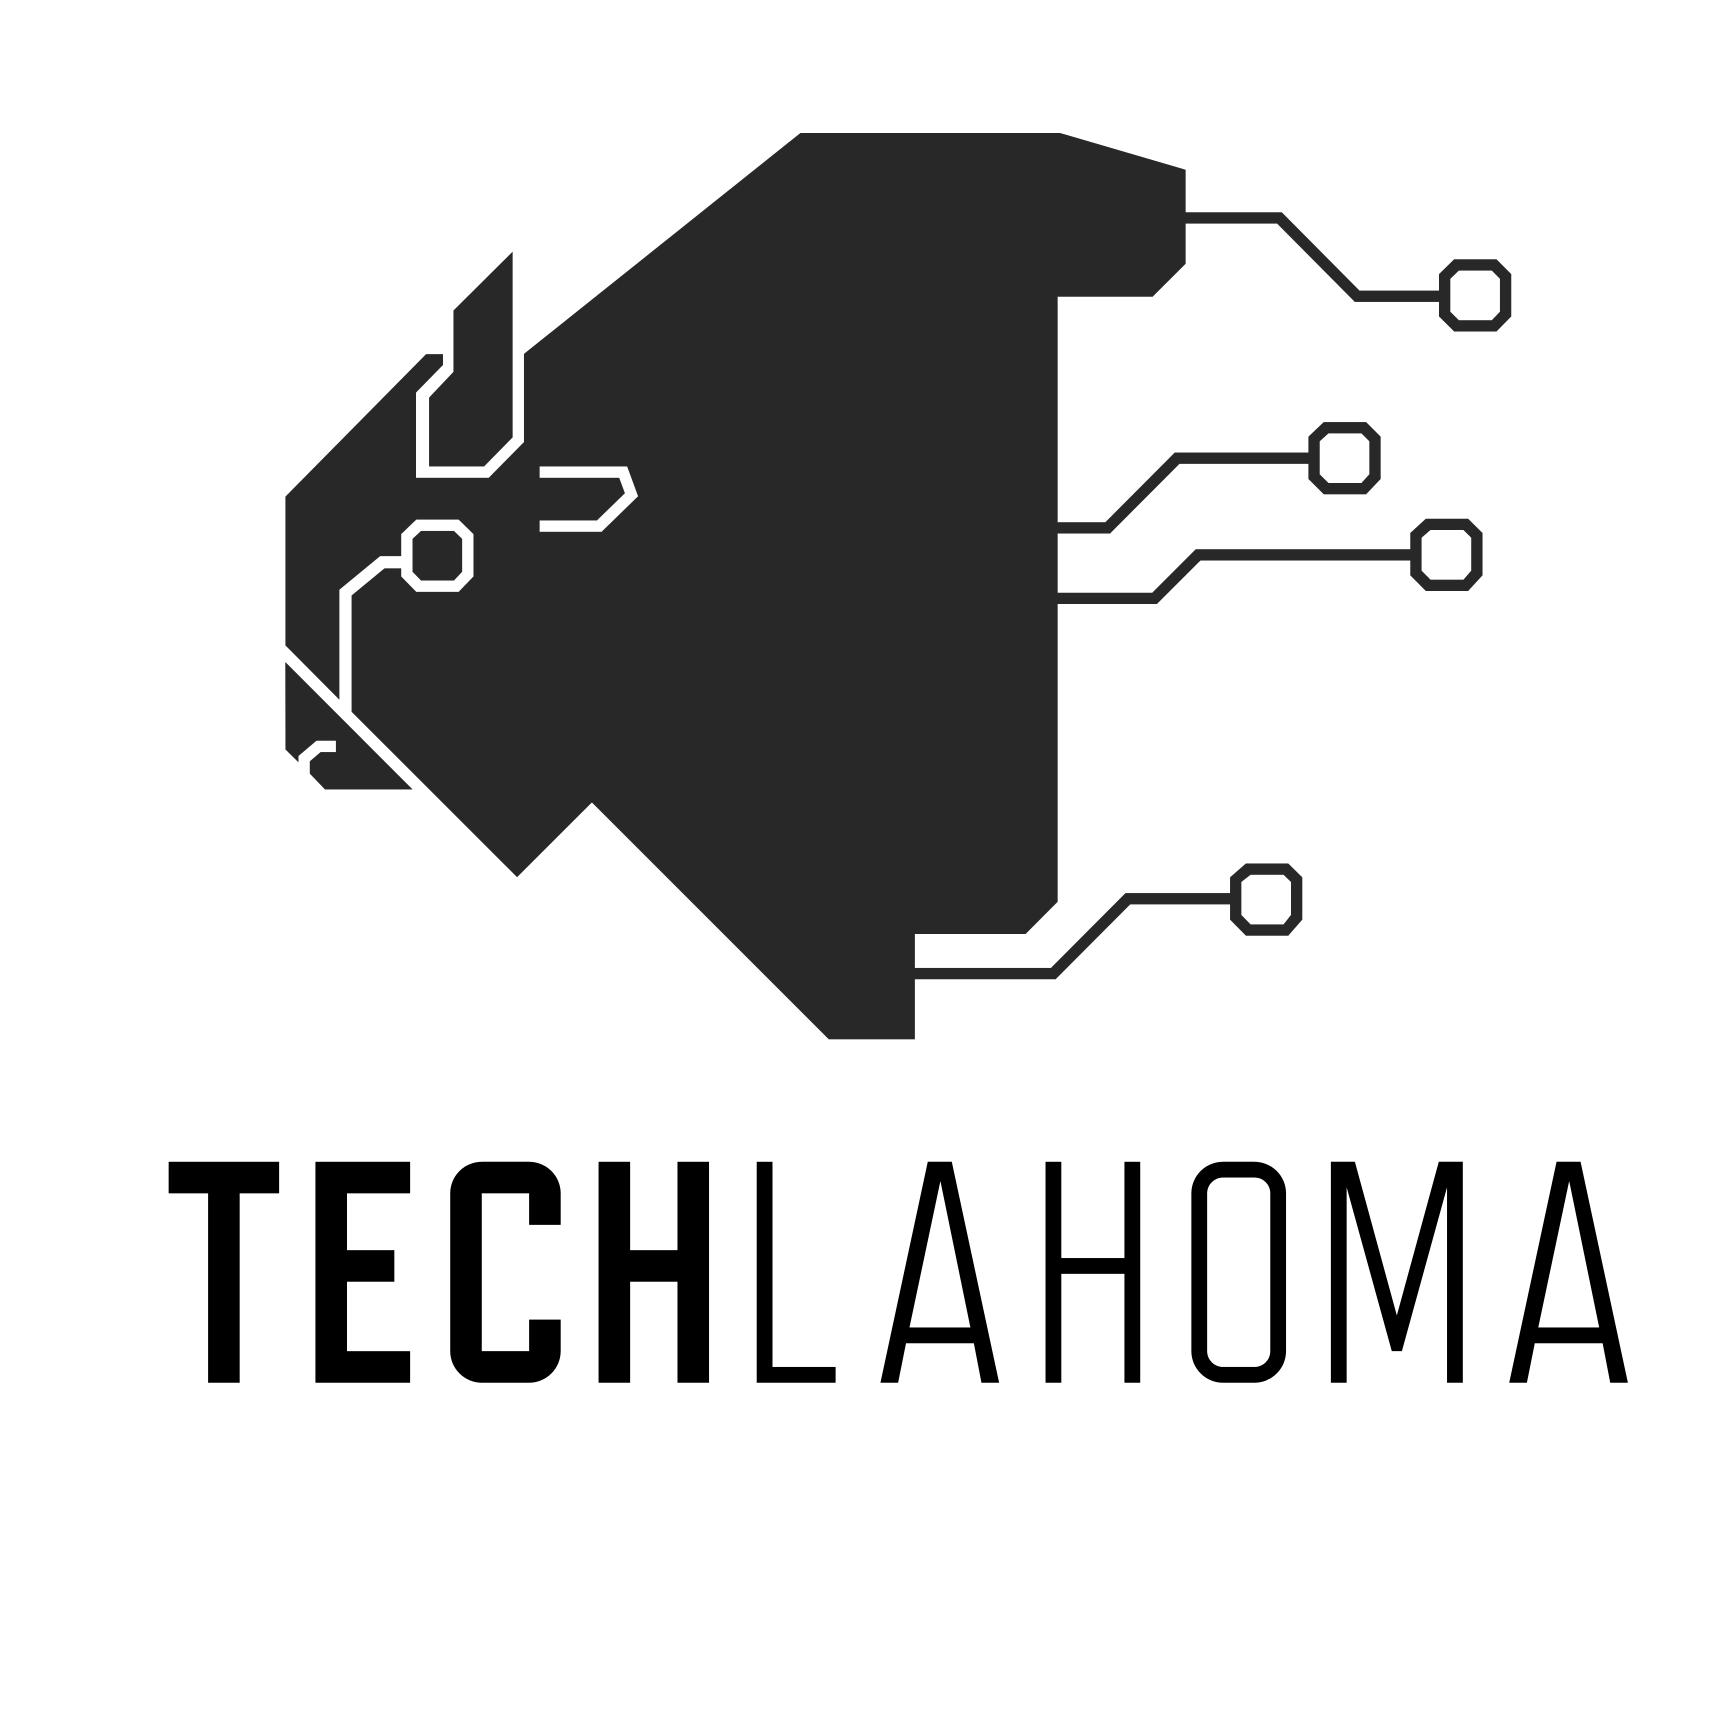 Techlahoma